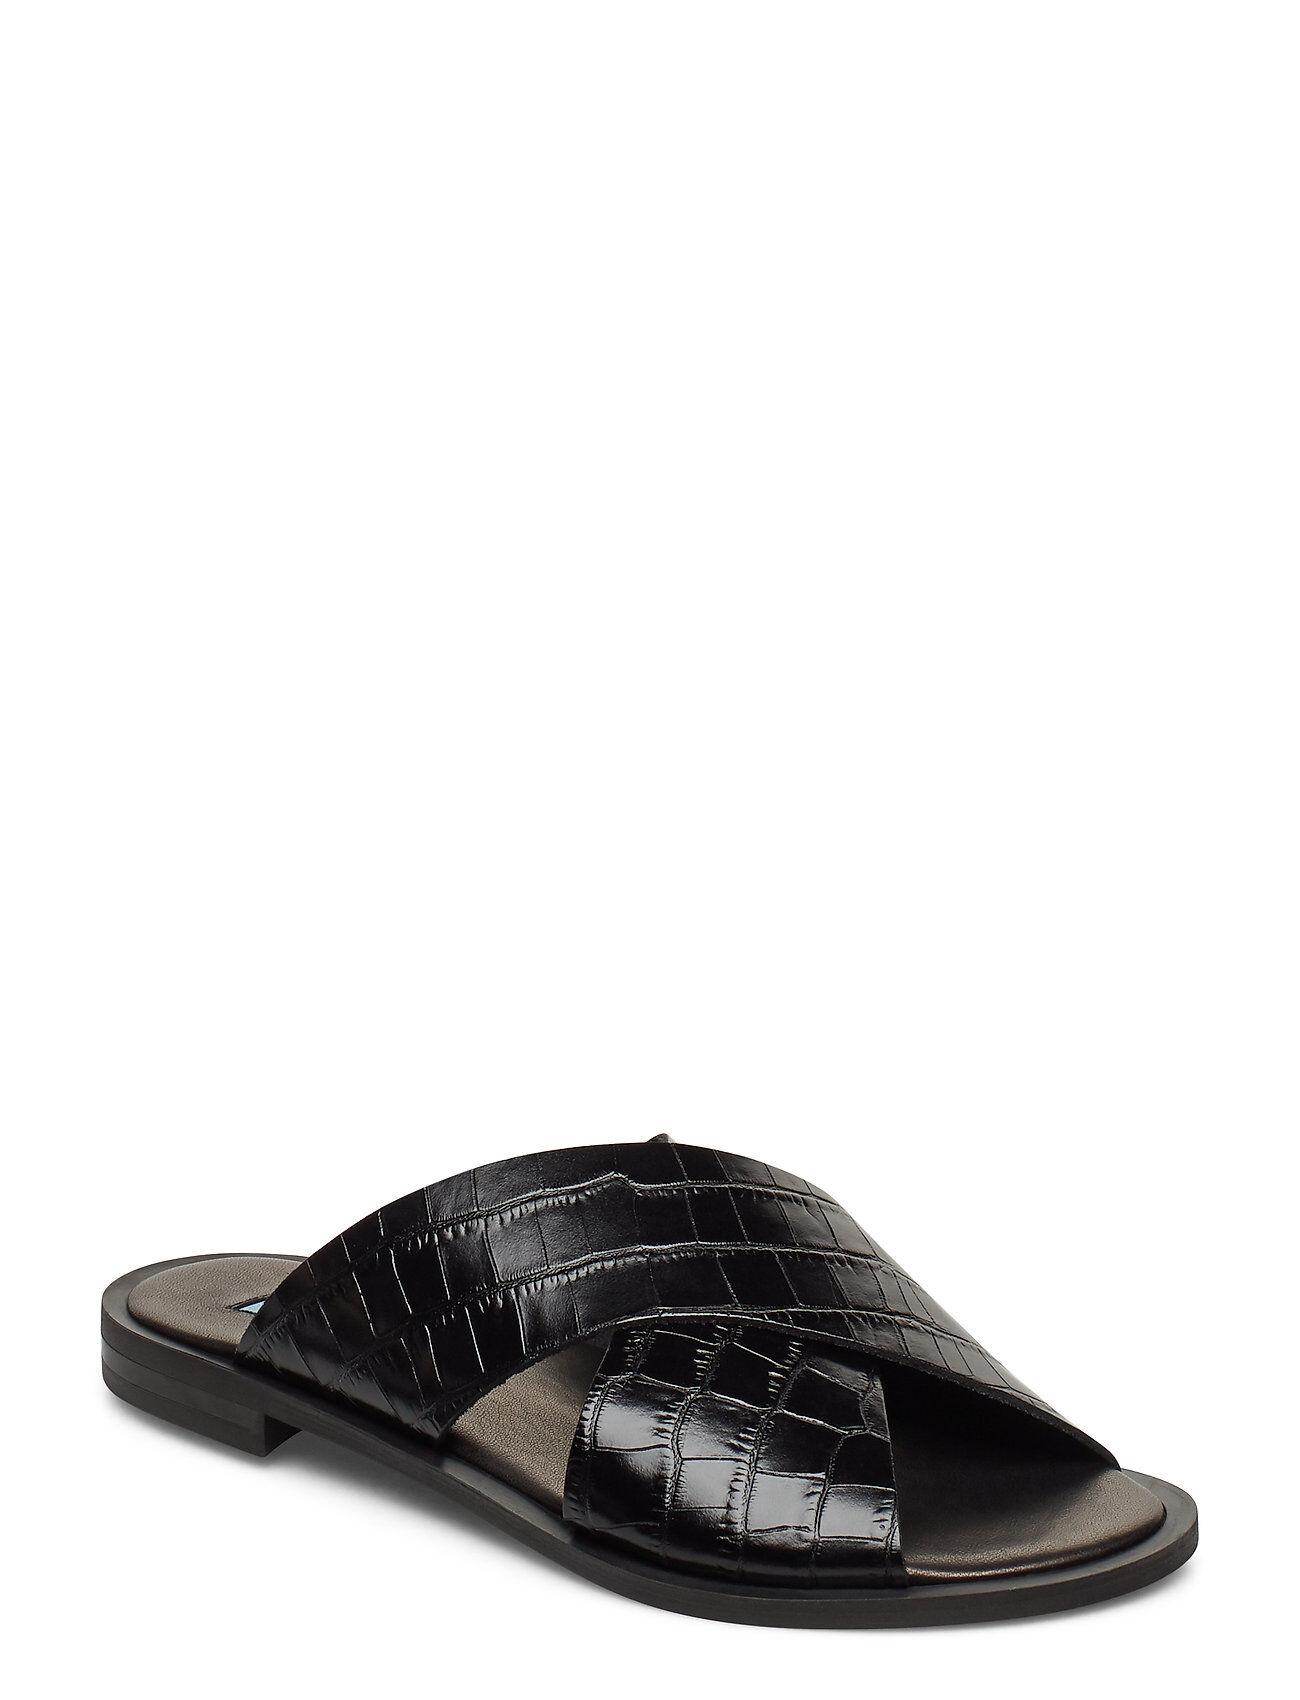 Apair Wide Cross Round Shoes Summer Shoes Flat Sandals Musta Apair